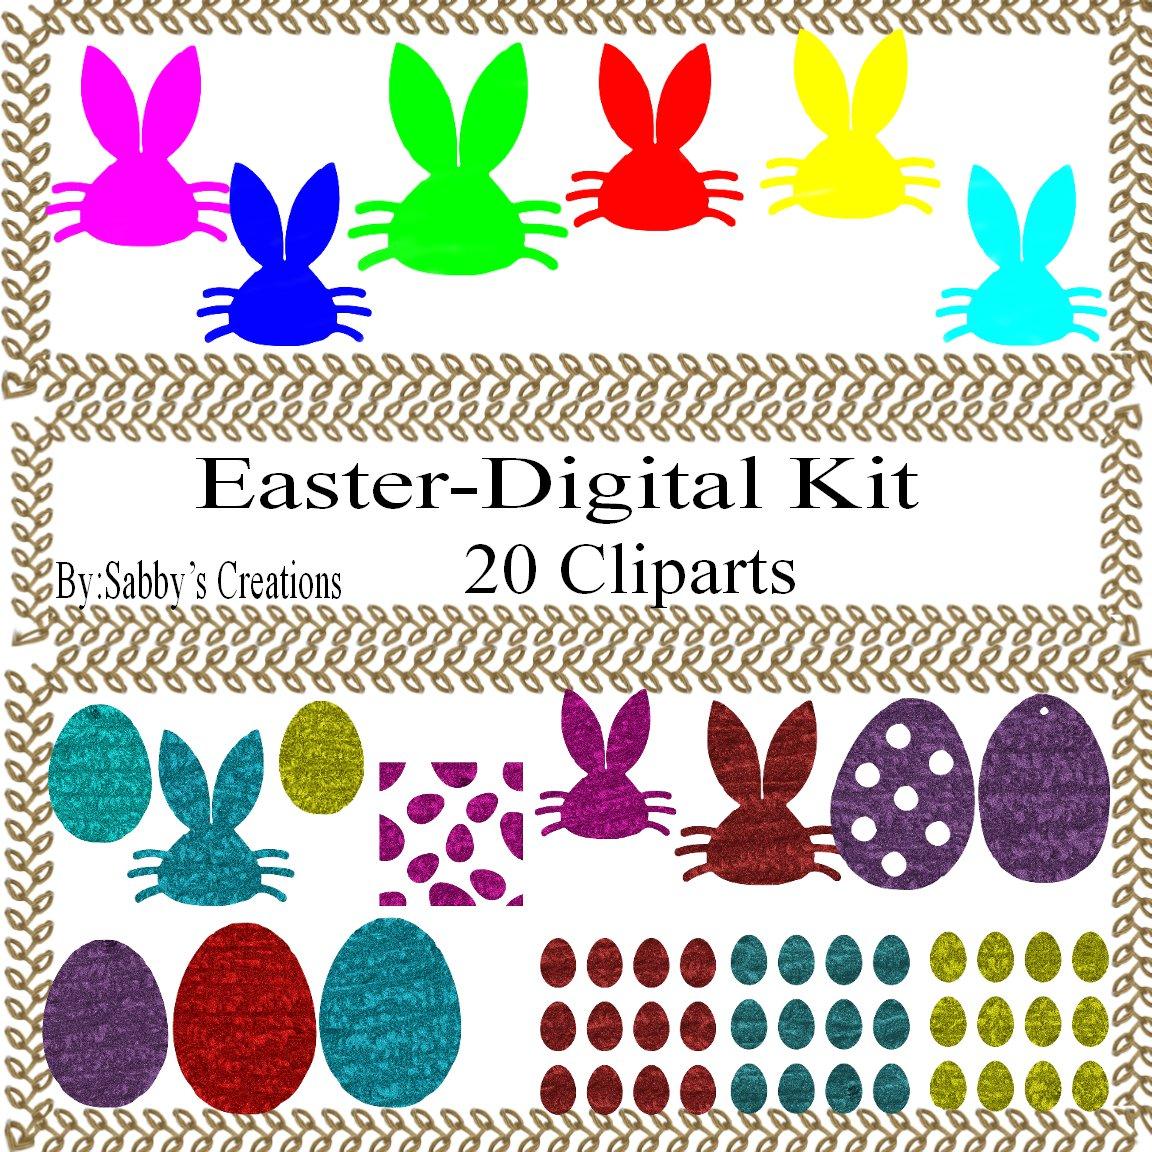 Easter Digital Kit 2-Digtial Paper-Rose-Art Clip-Gift Tag-Jewelry-T shirt